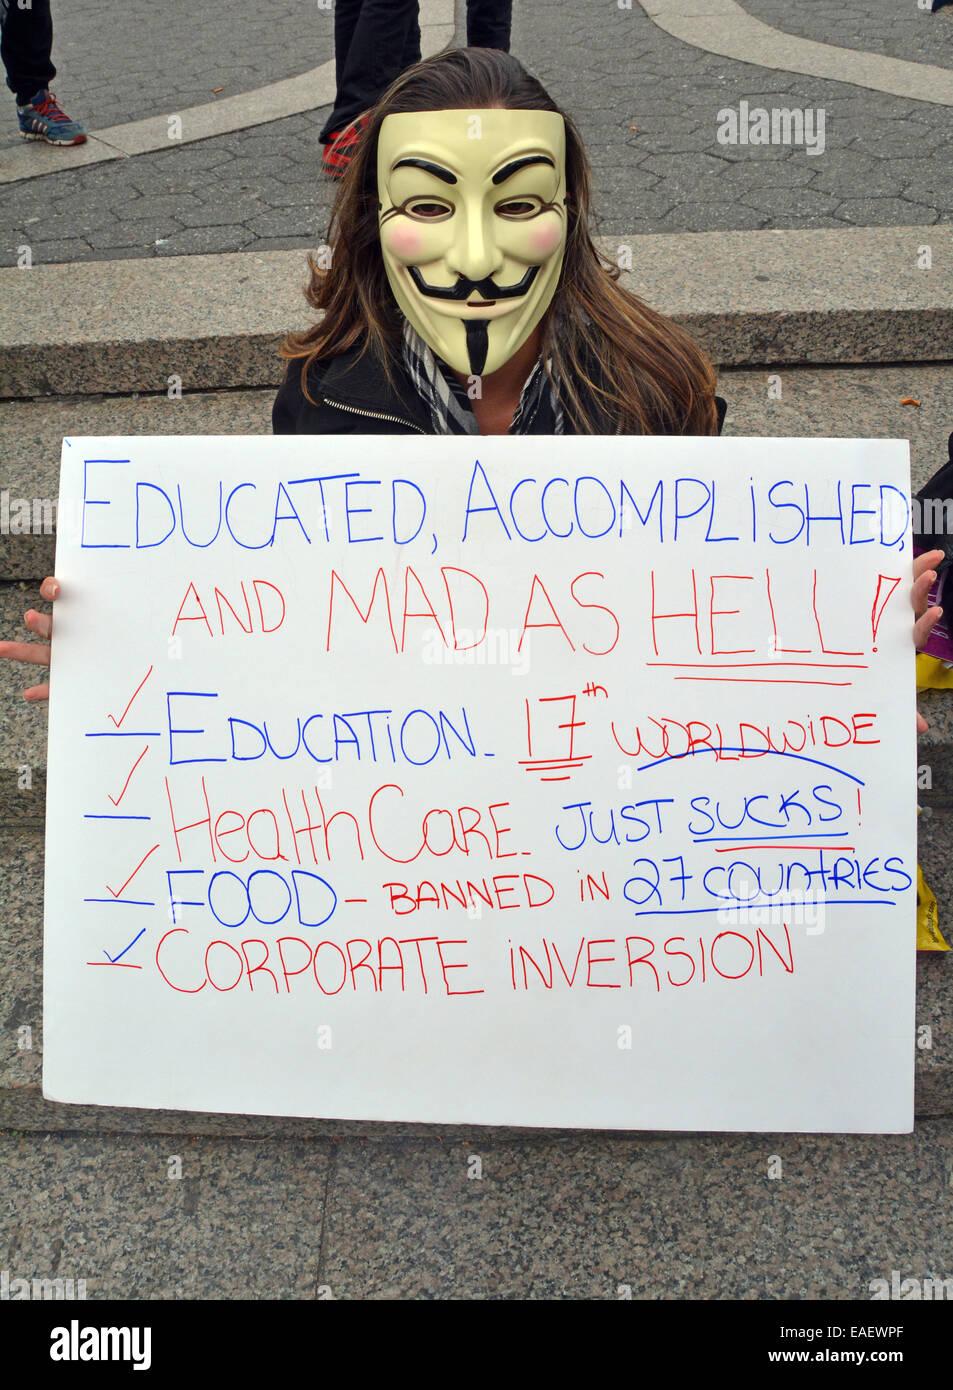 Ein Demonstrant auf die Million Maske Day Demonstration am 11.5.2014 am Union Square Park in New York City Stockbild